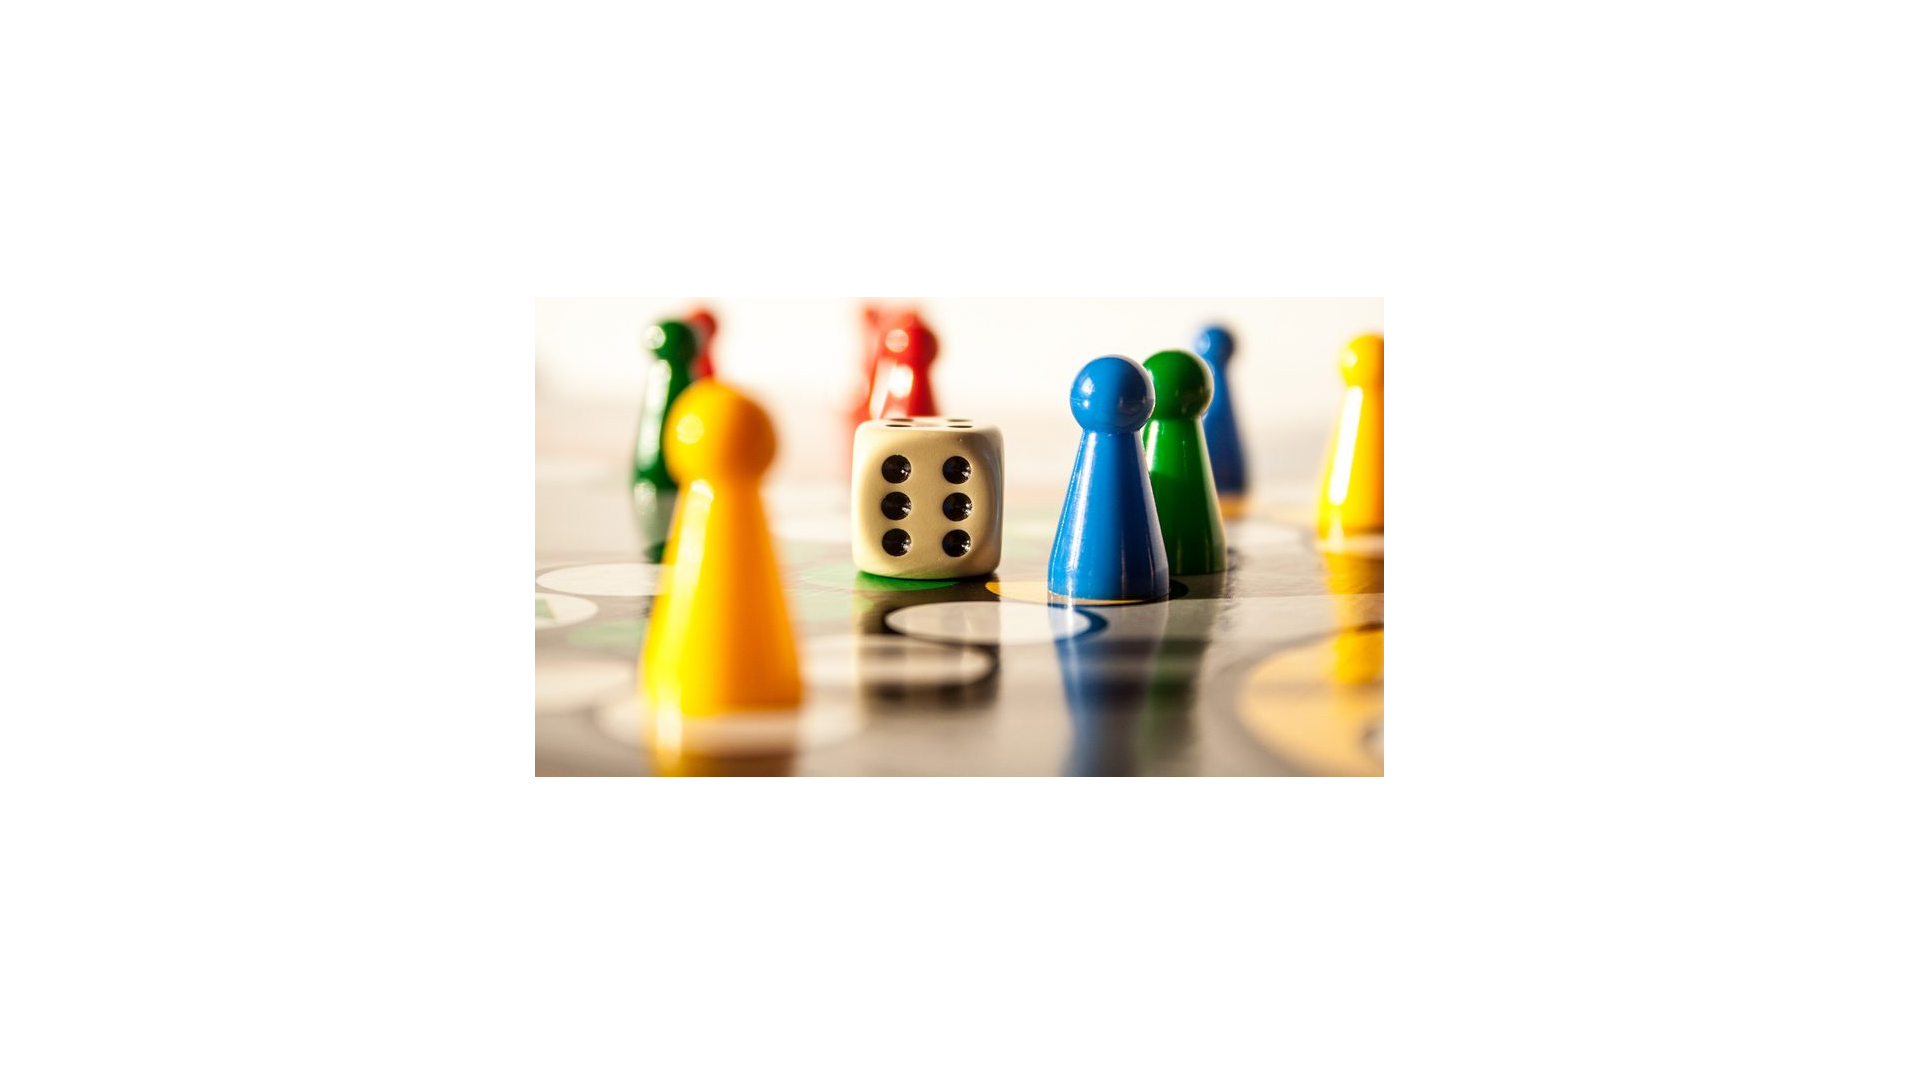 Fête du jeu en Veveyse